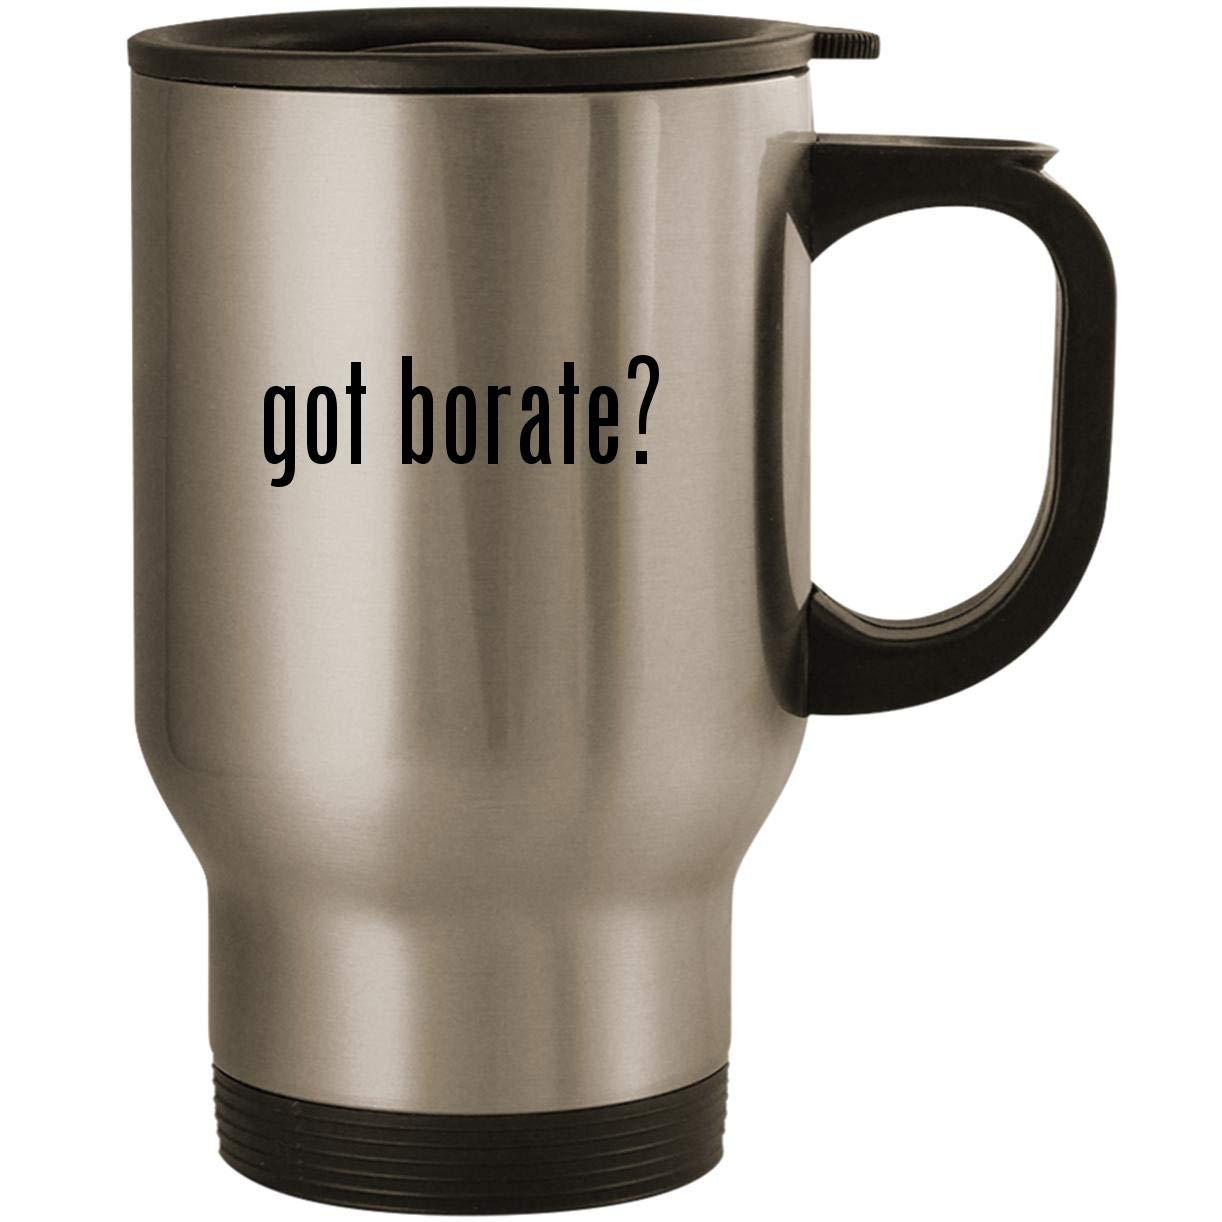 got borate? - Stainless Steel 14oz Road Ready Travel Mug, Silver